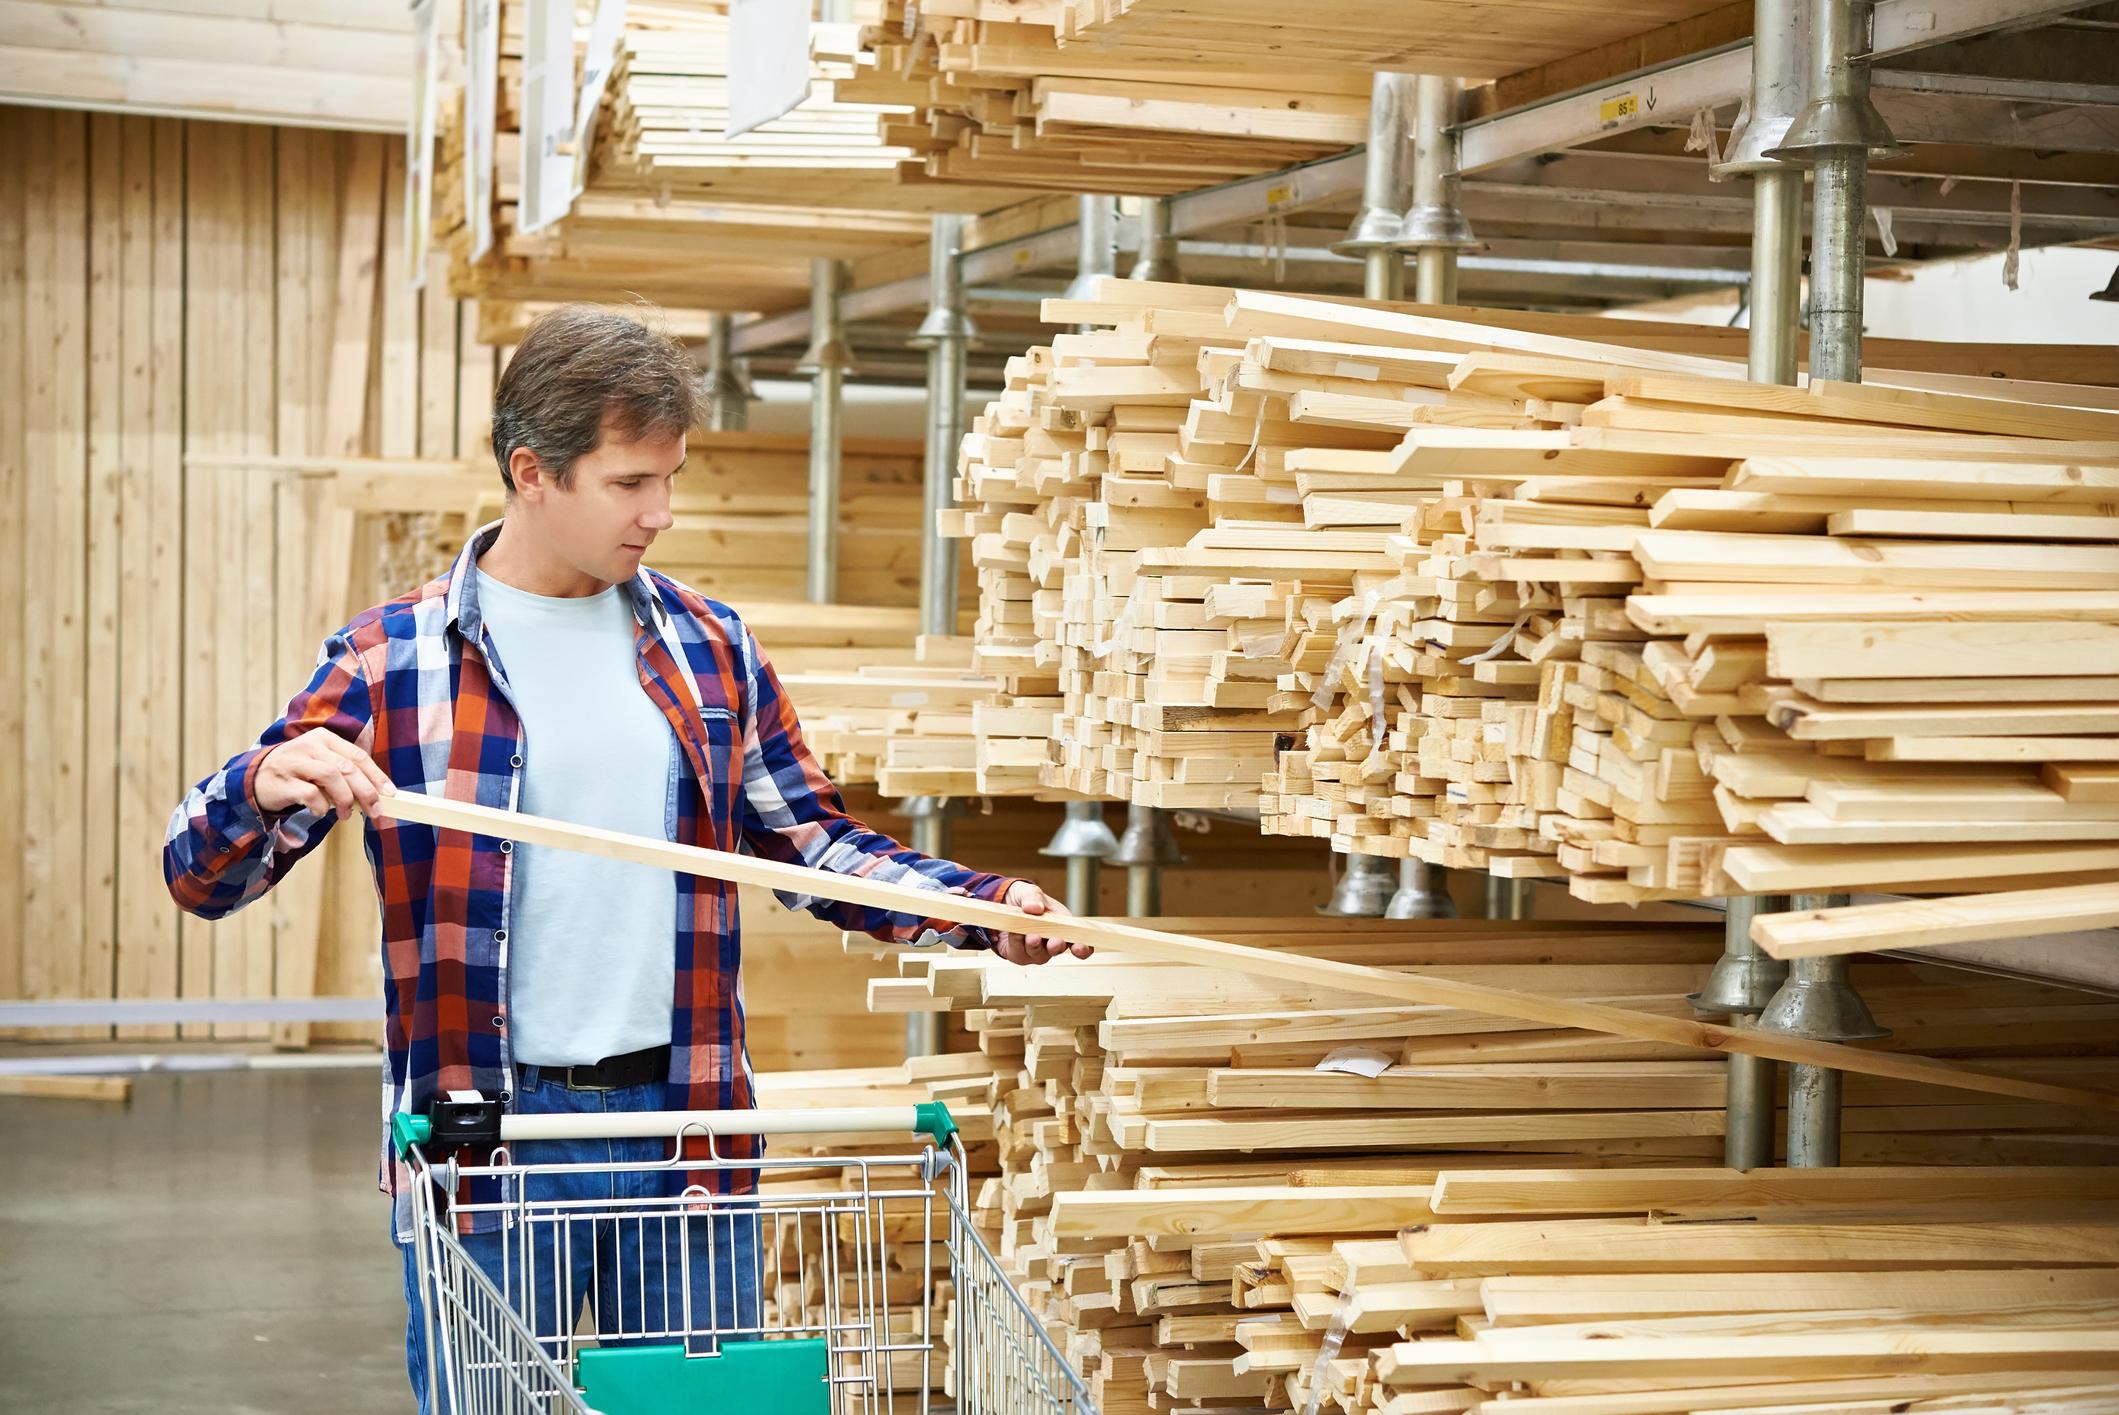 A shopper buys lumber.